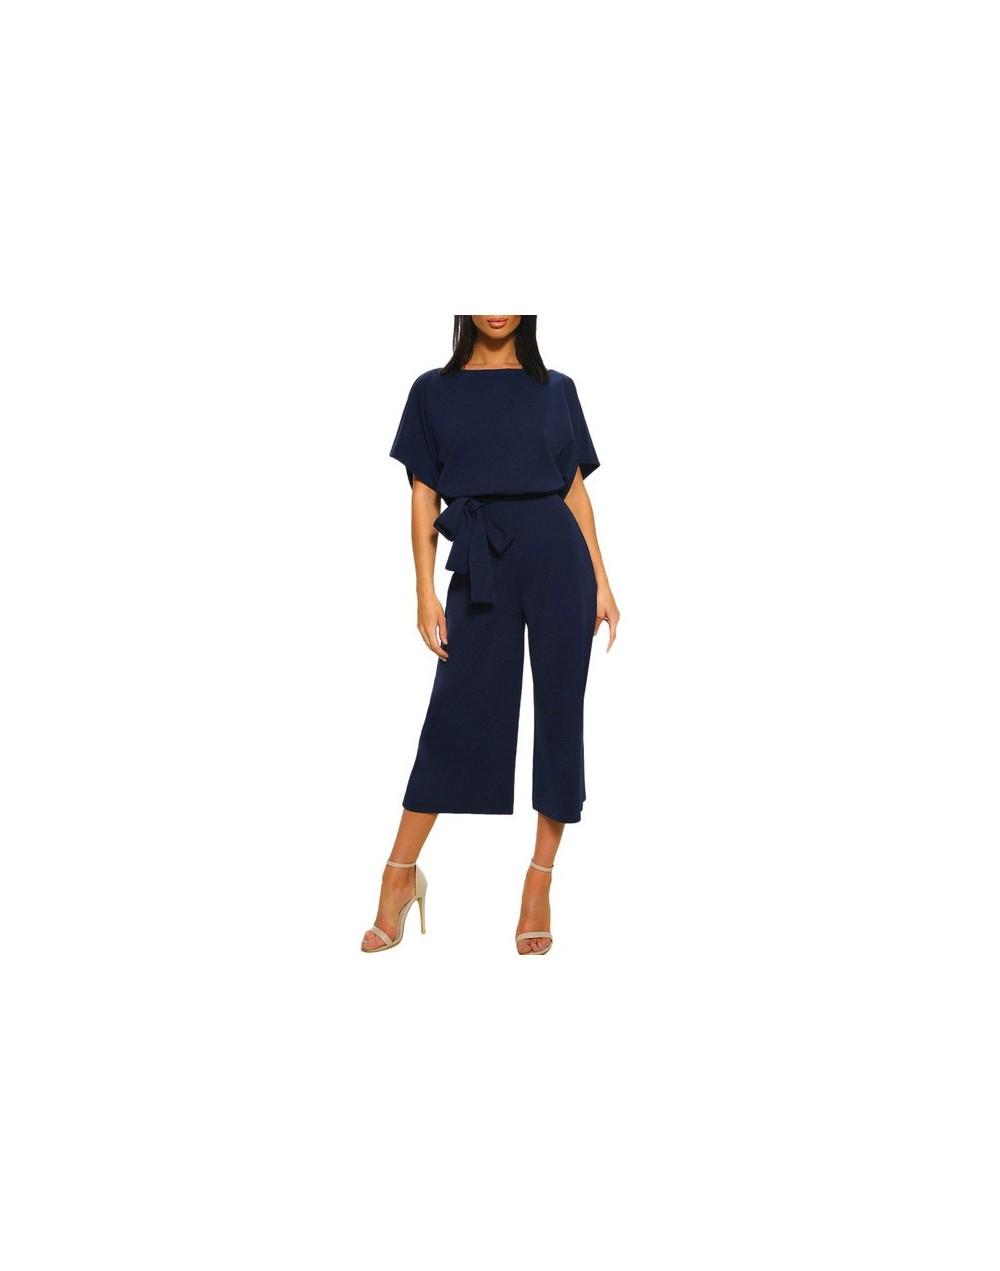 Women Short Sleeve Playsuit Clubwear Straight Leg Jumpsuit With Belt Fashion plus size Loose Summer Jumpsuits June 23 - Navy...